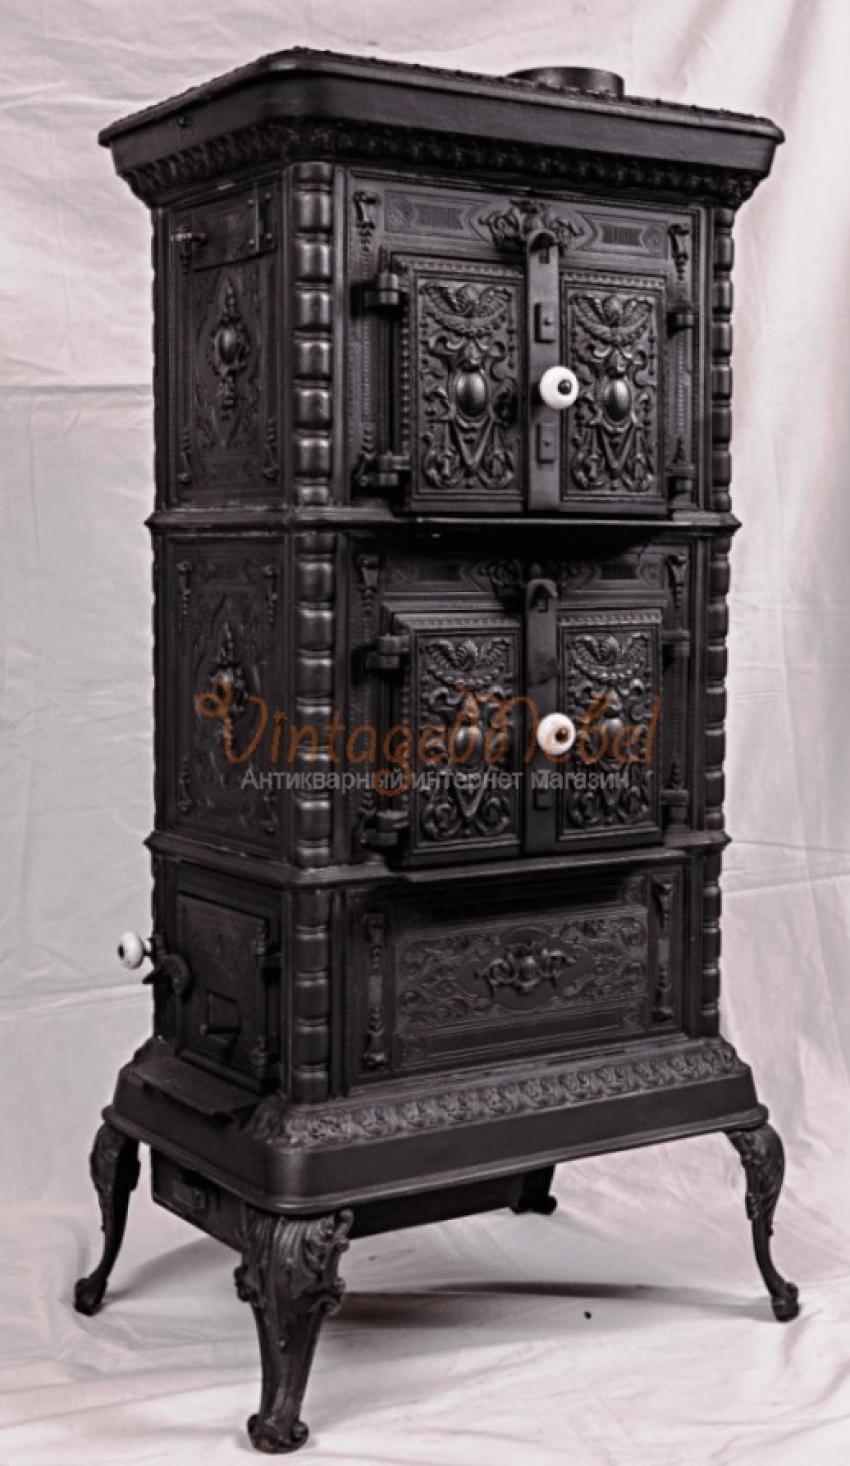 Oven made of cast iron. Czech Republic - photo 2